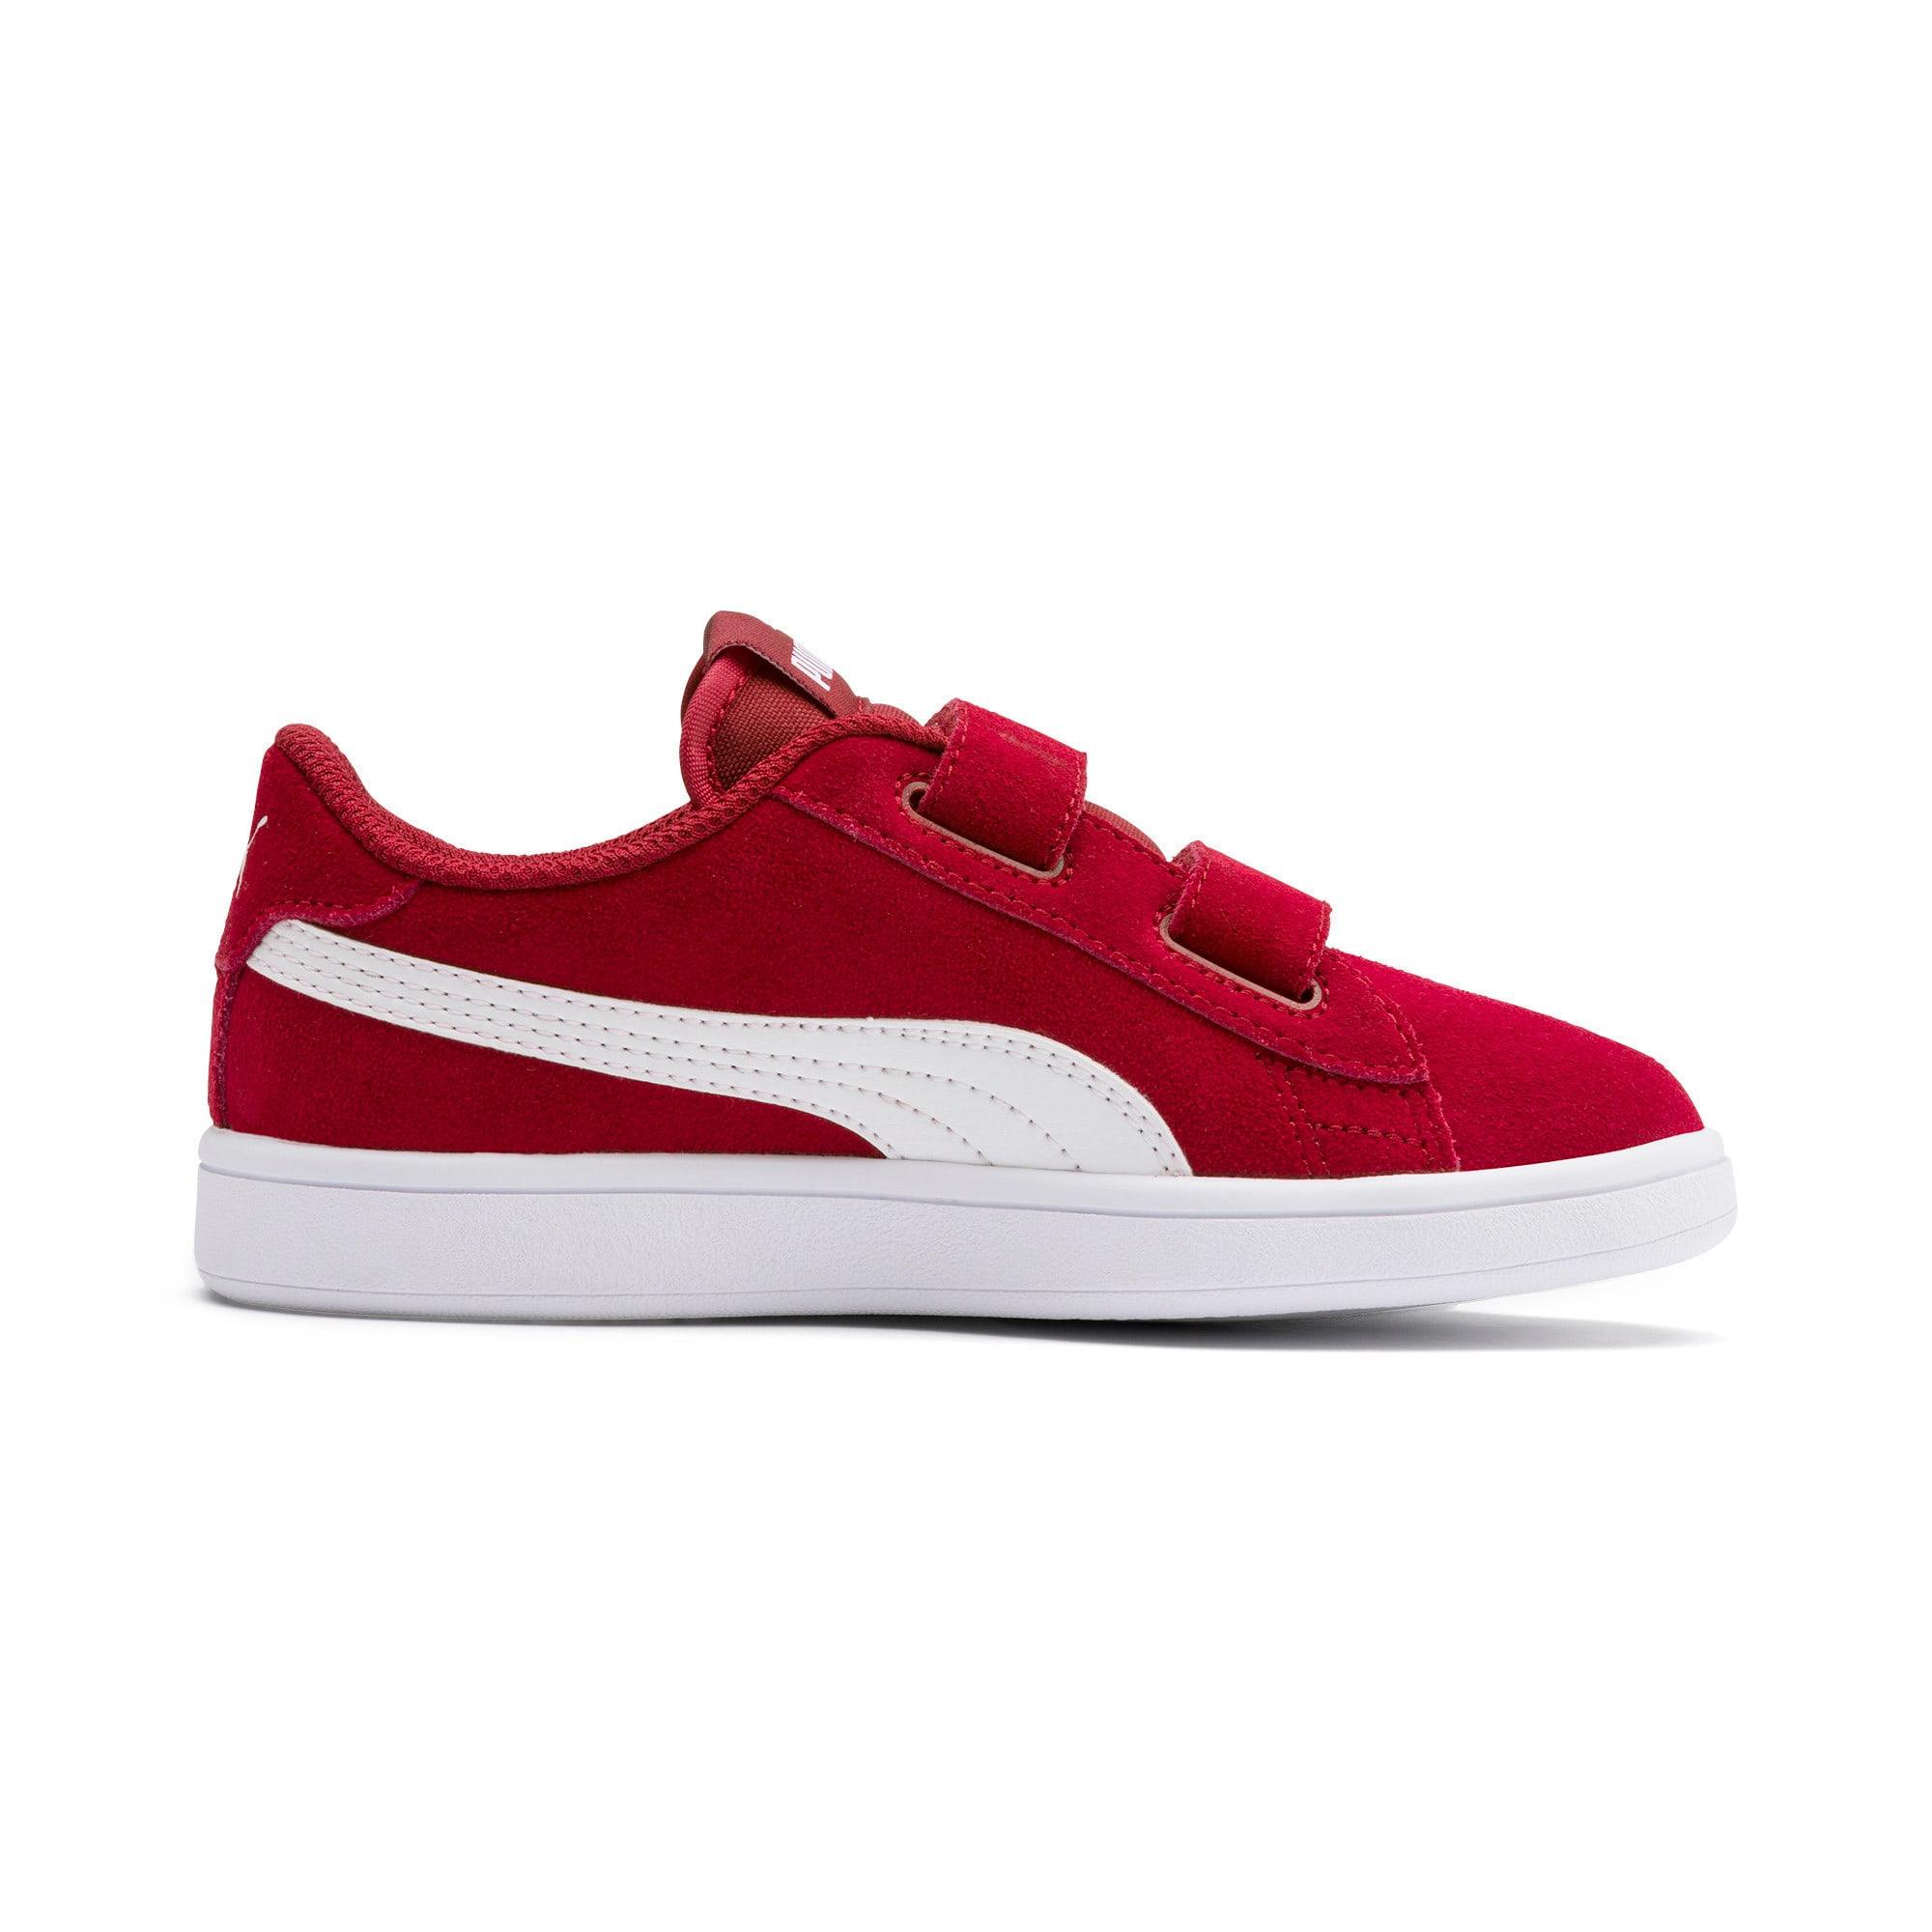 Thumbnail 5 of Smash v2 Suede Little Kids' Shoes, Rhubarb-Puma White, medium